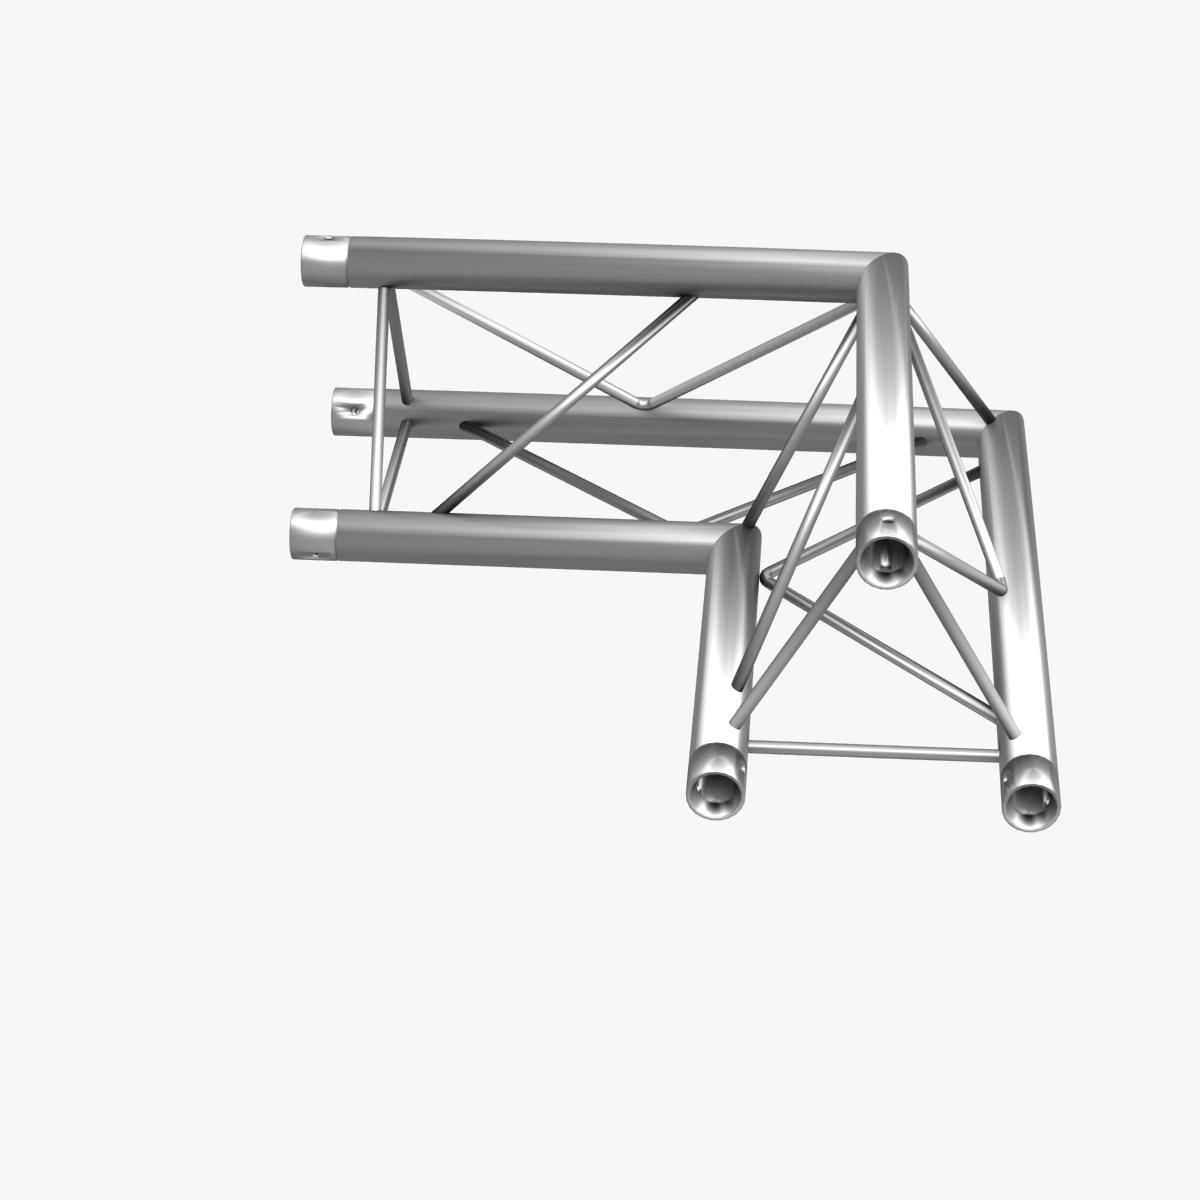 triangular trusses (collection 55 modular pieces) 3d model 3ds max dxf fbx c4d dae texture obj 216258